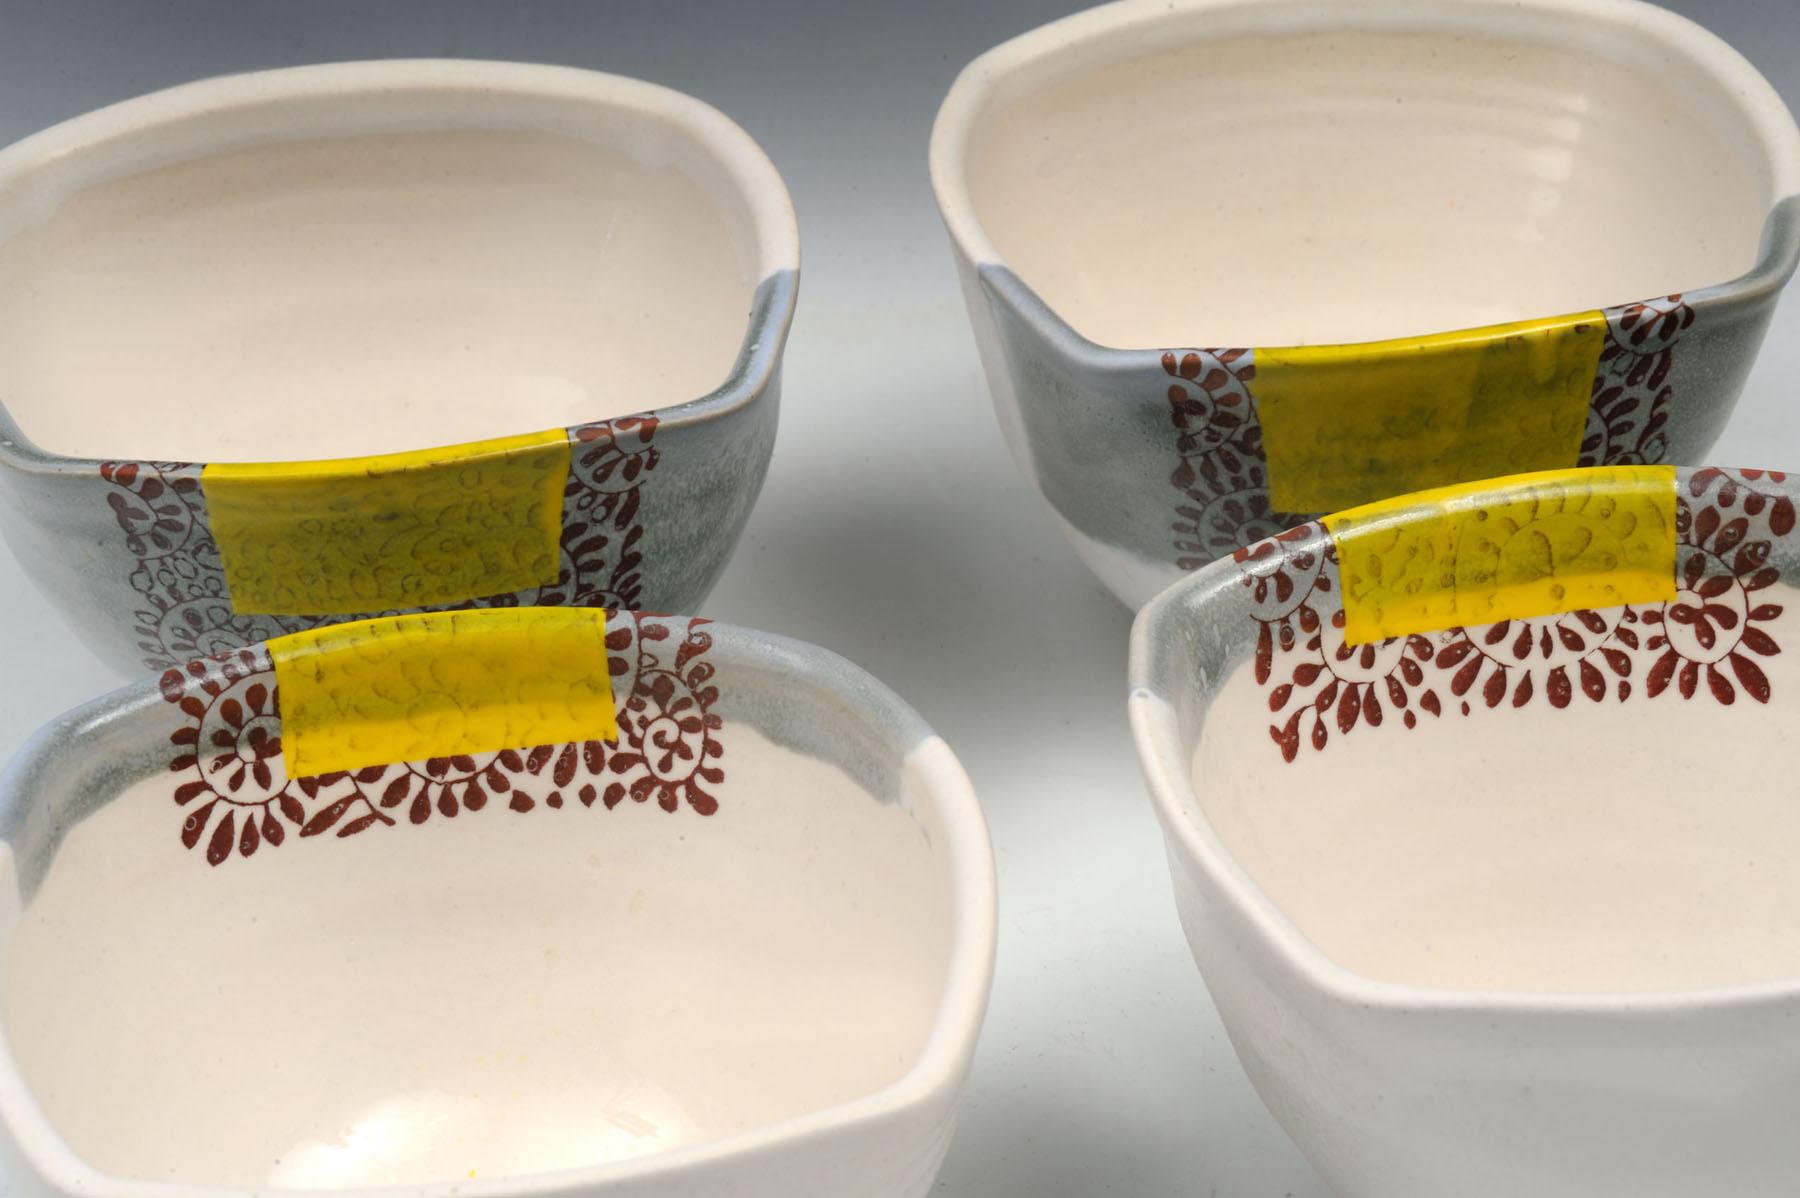 10 bowls